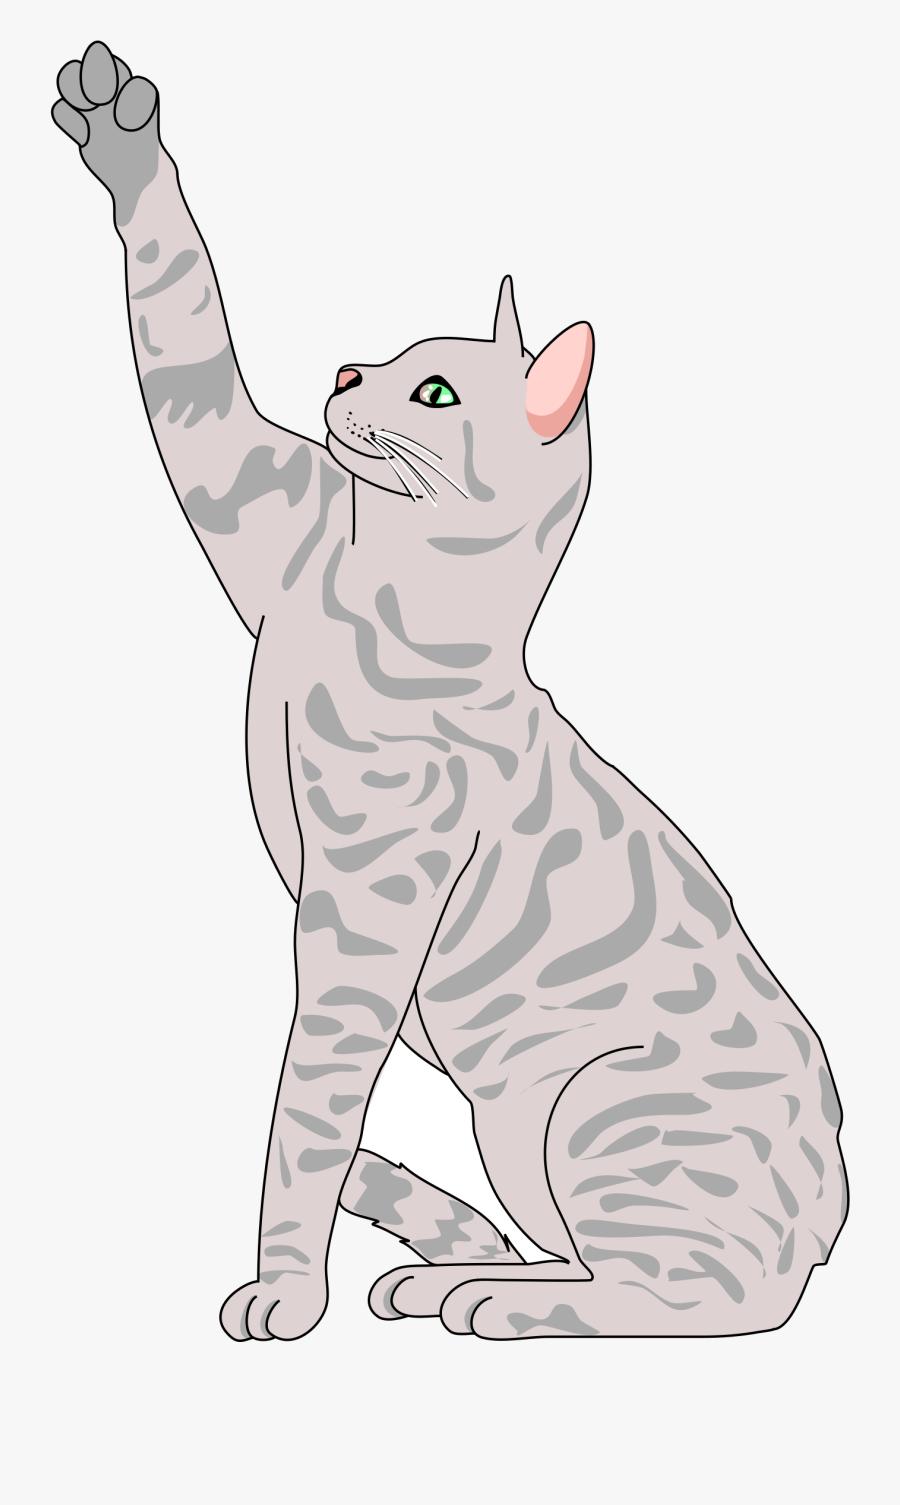 Kittens Clipart Playful - Realistic Cat Clip Art, Transparent Clipart